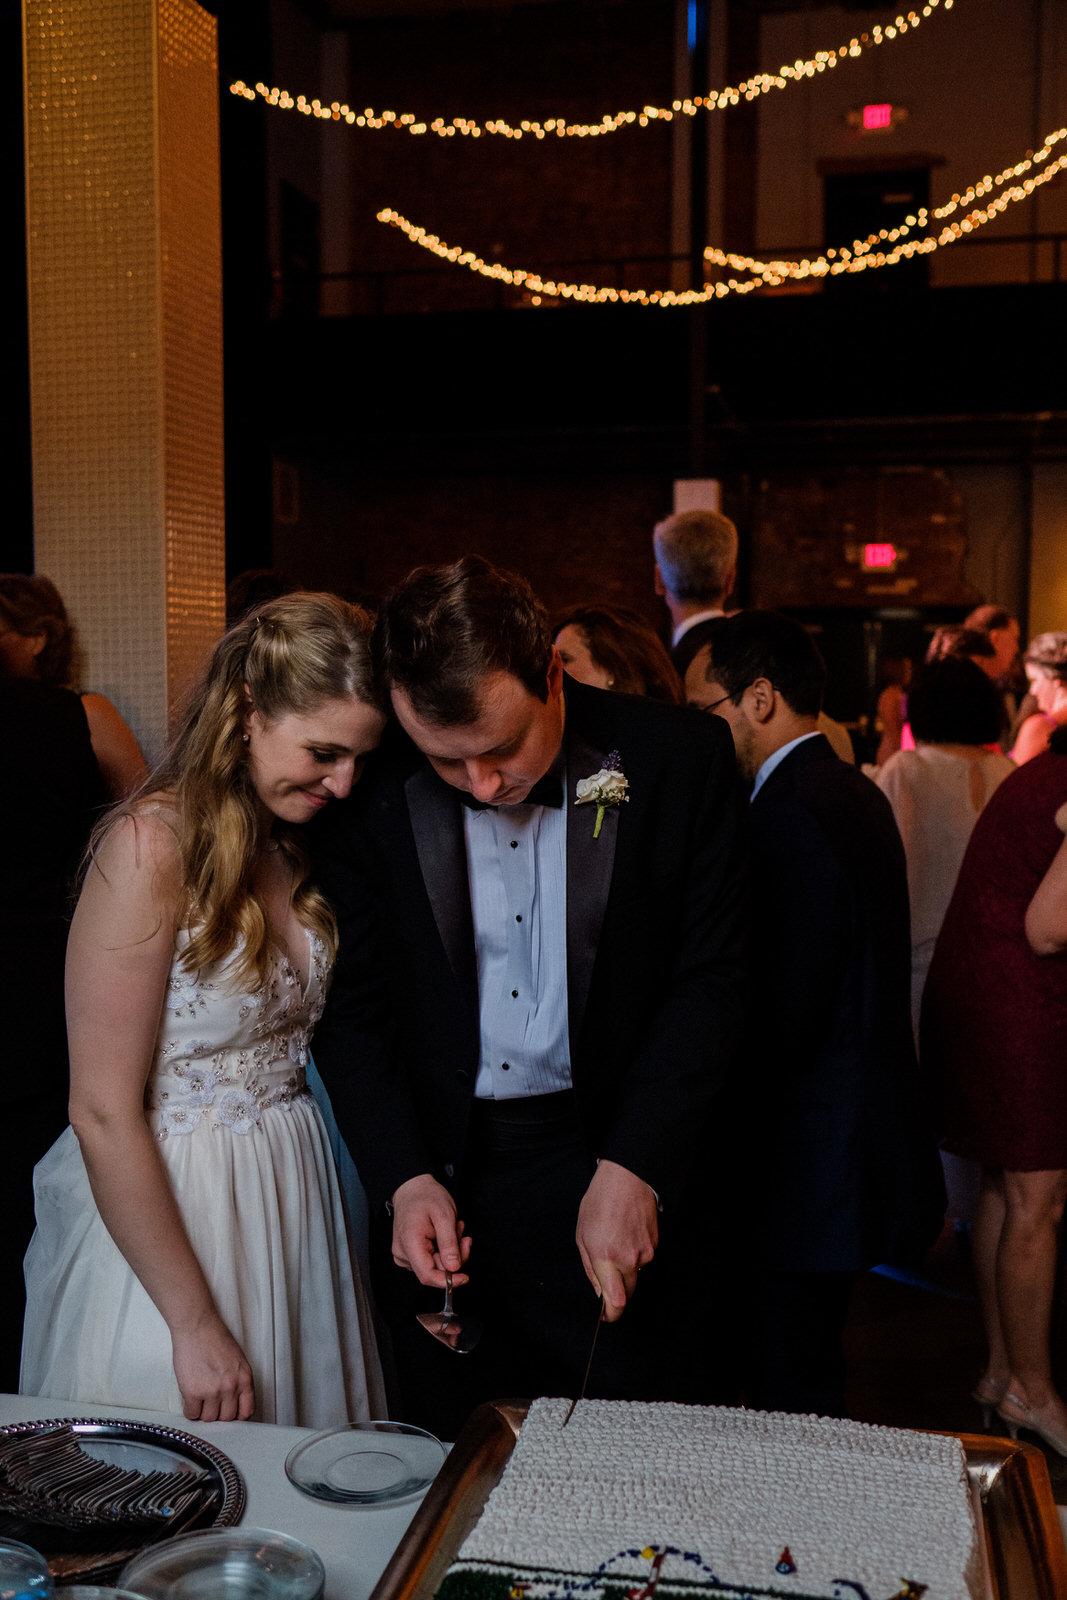 Oxford_Mississippi_wedding_photographer_36.JPG